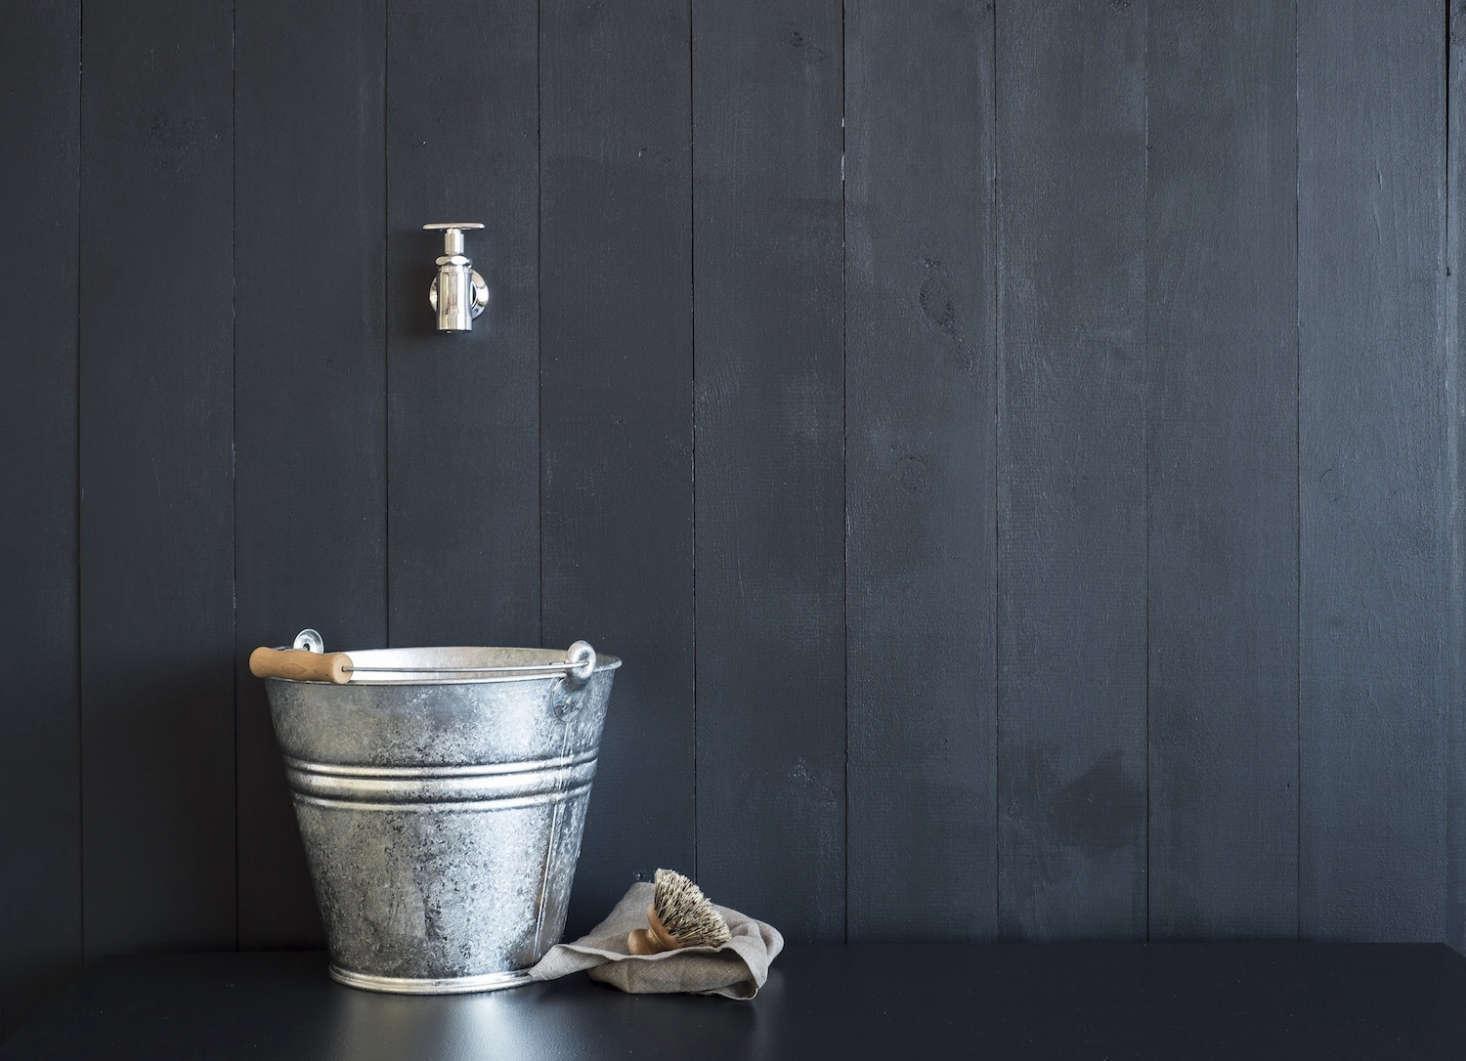 Diy A Simple Outdoor Sink Gardenista